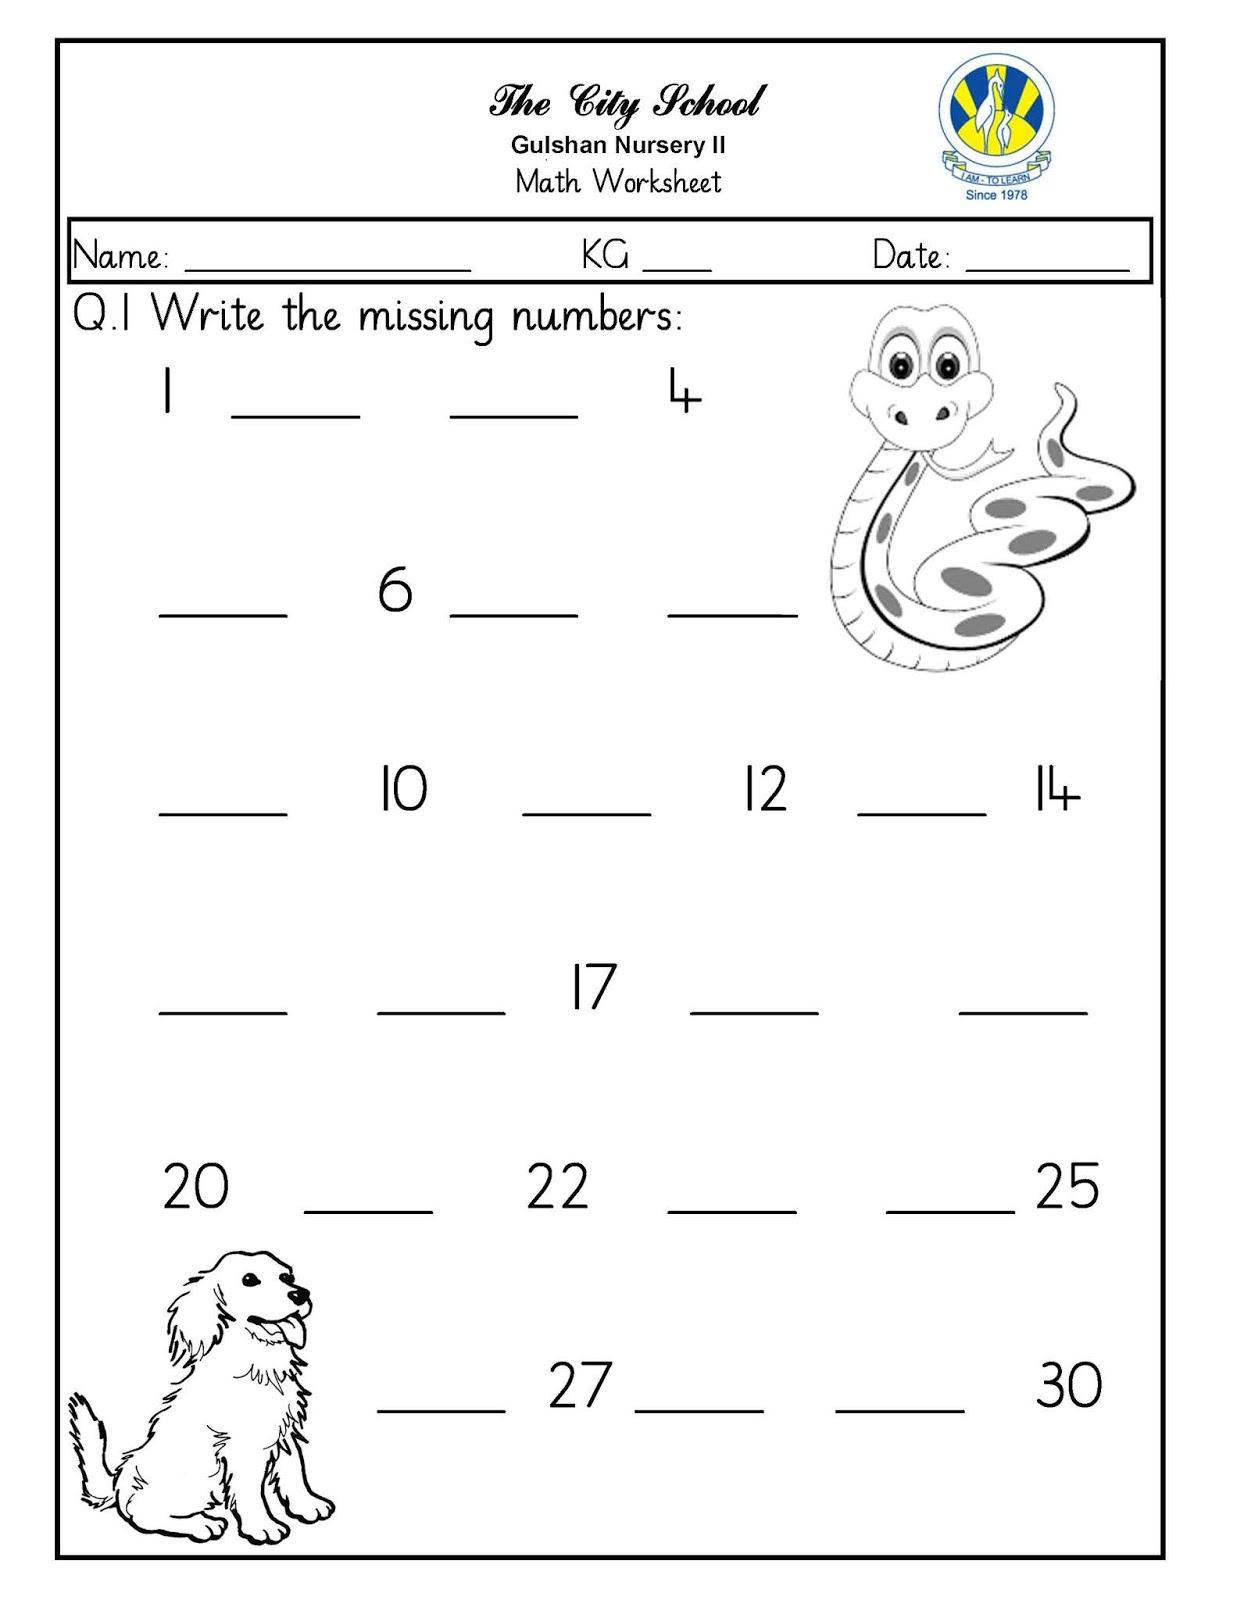 Sr Gulshan The City Nursery Ii Math Worksheets